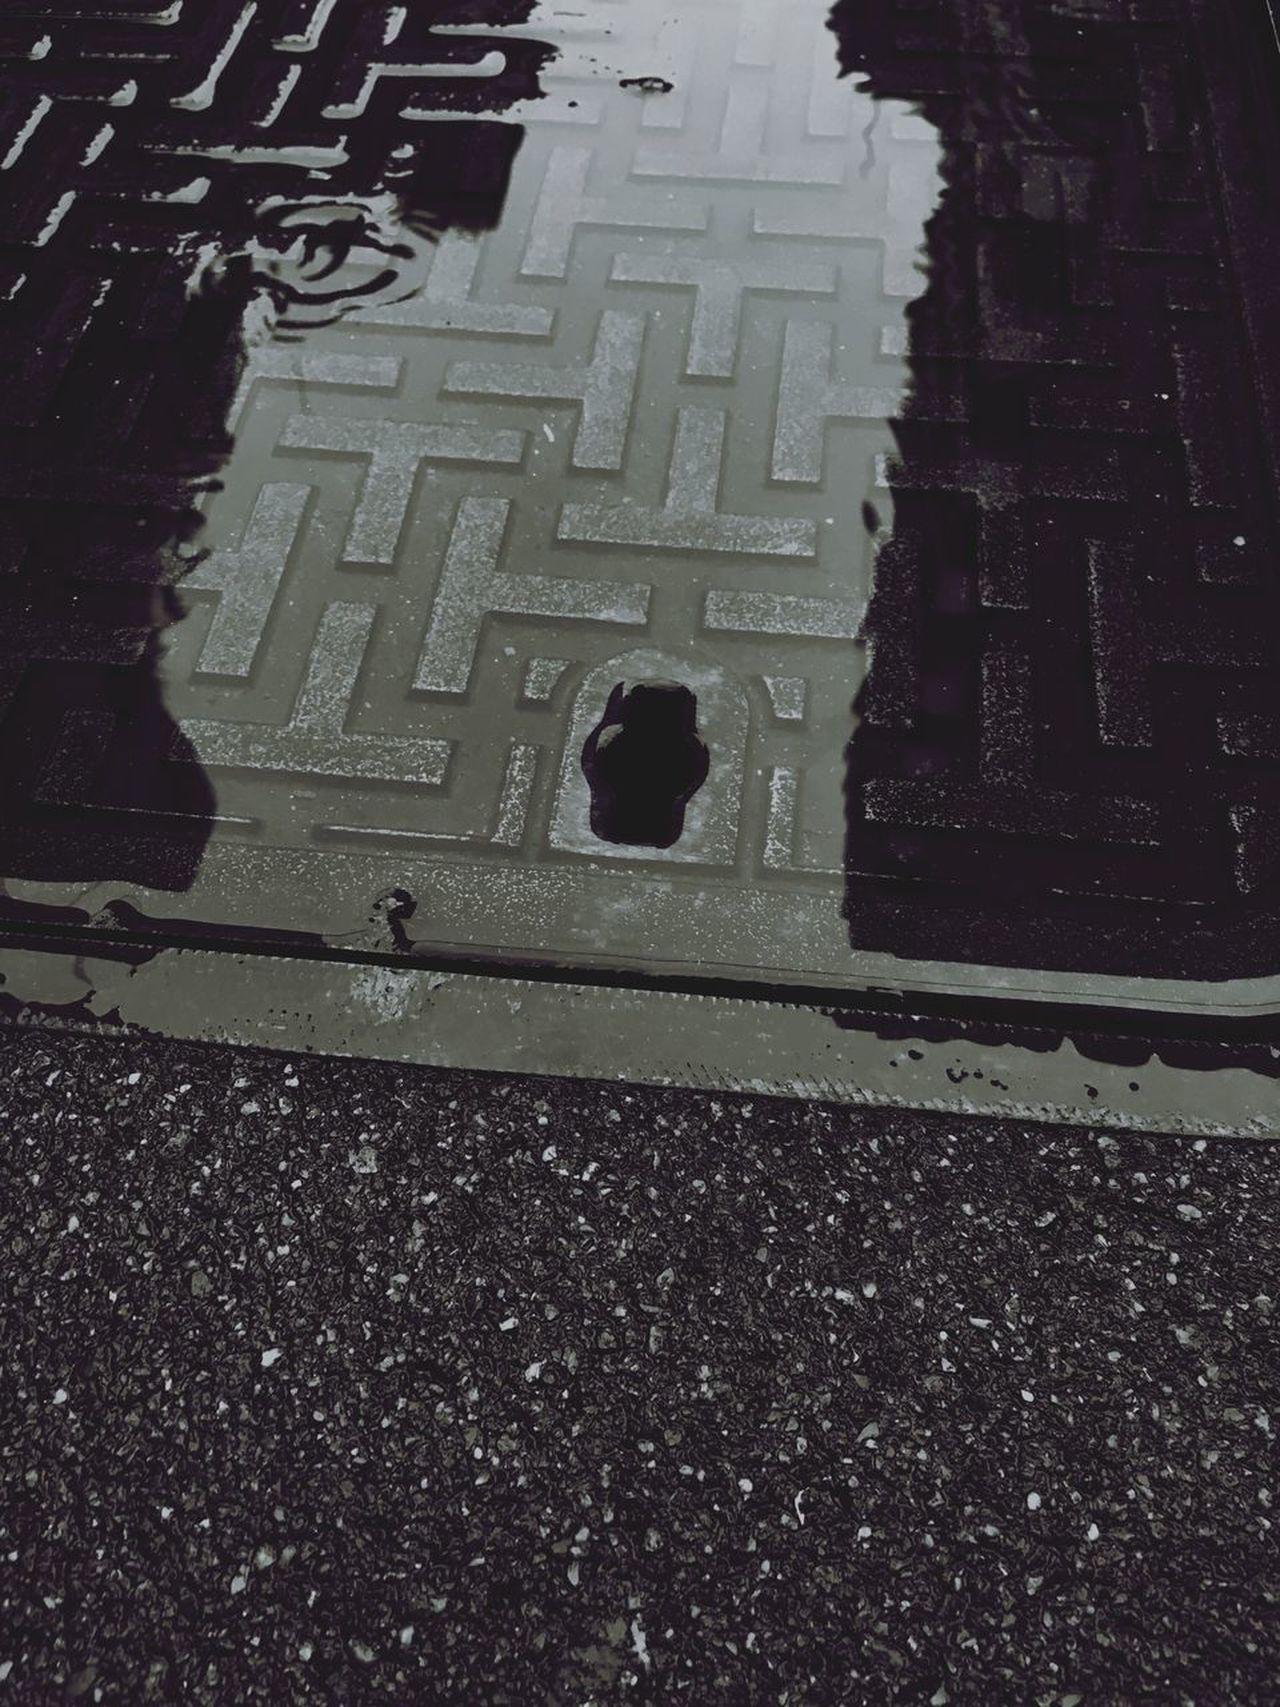 Rain Street Puddle Ground